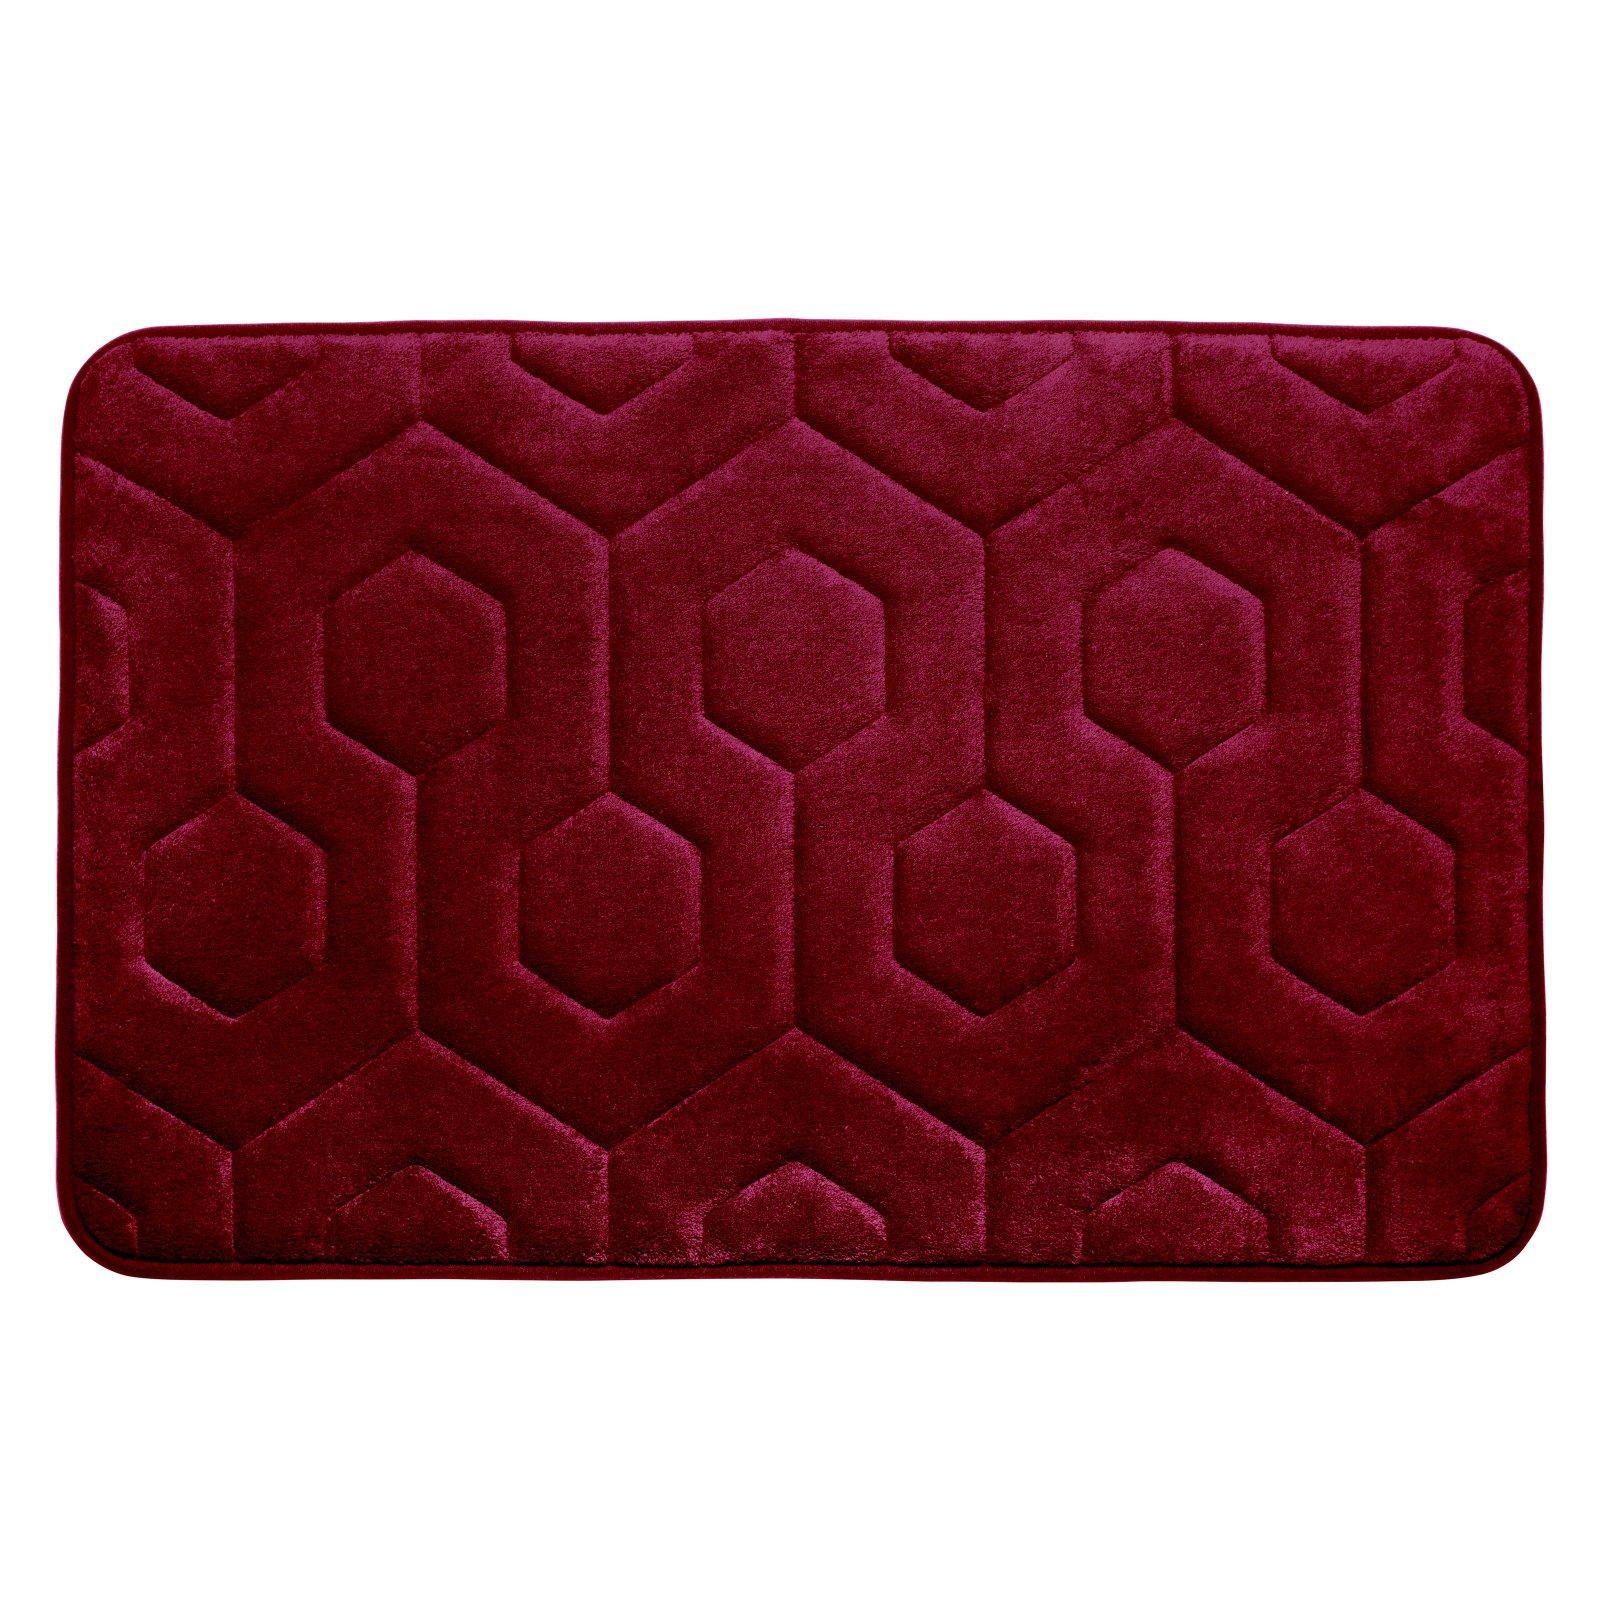 Bounce Comfort Hexagon Premium Memory Foam Bath Mat